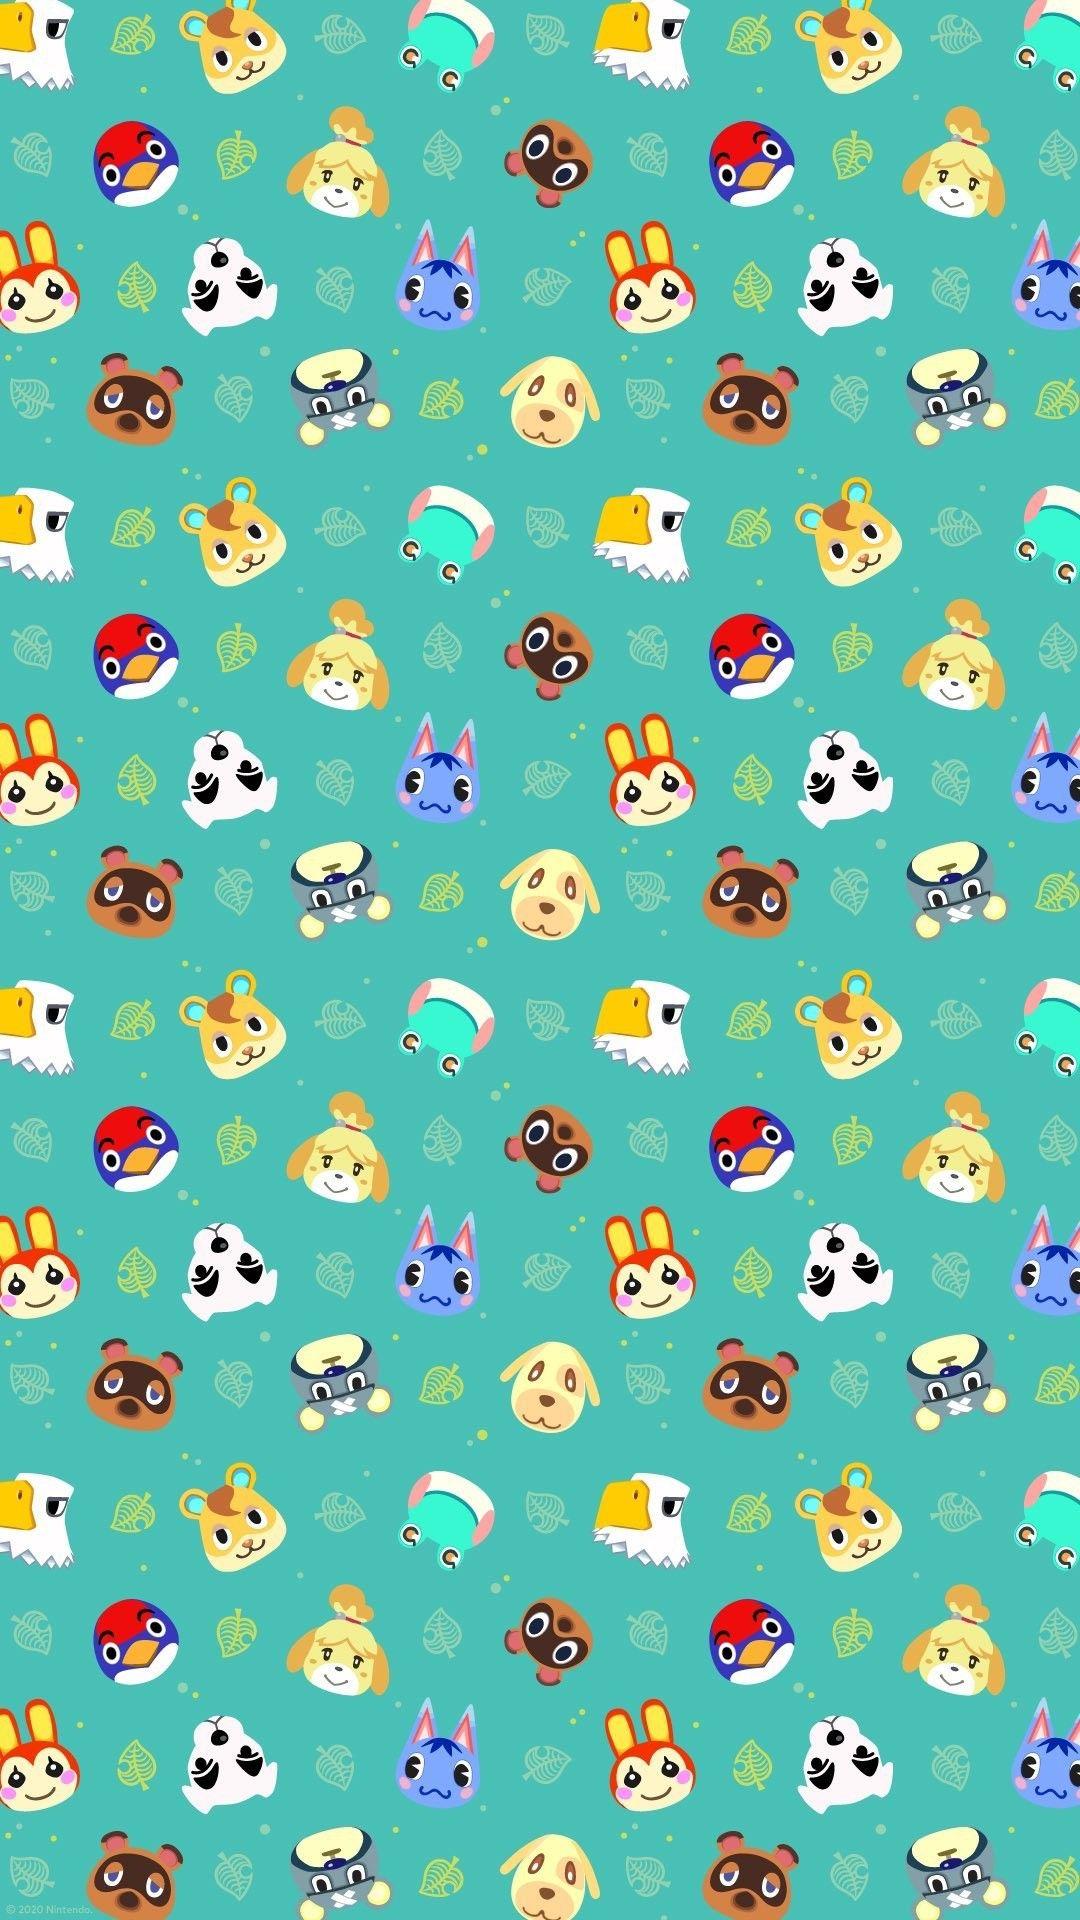 Fondo De Pantalla Animal Crossing New Horizons Animalcrossing Nintendoswitch Tomnook Canela In 2020 Animal Crossing Animal Crossing Characters Animal Crossing Game